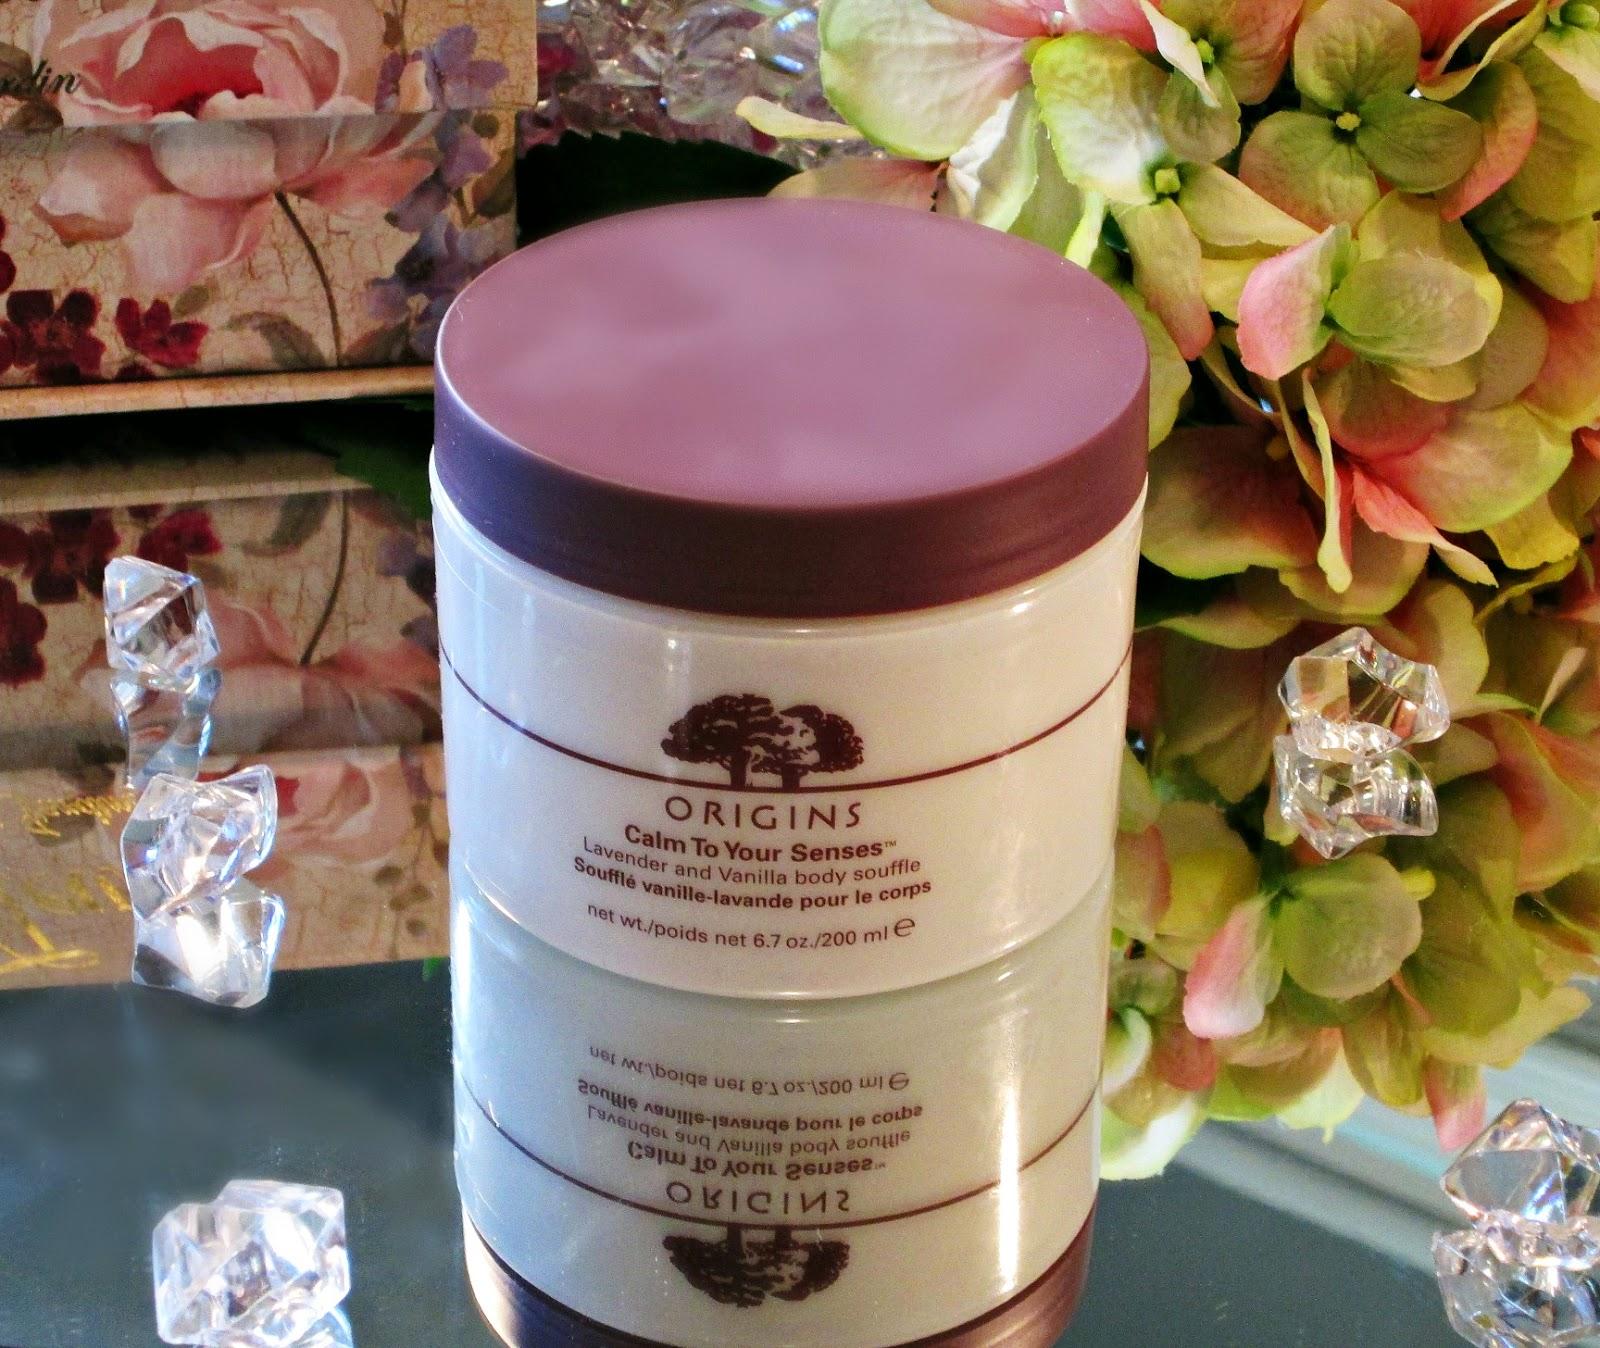 http://chrysalisbeautybag.blogspot.com/2015/04/origins-calm-to-your-senses-lavender.html